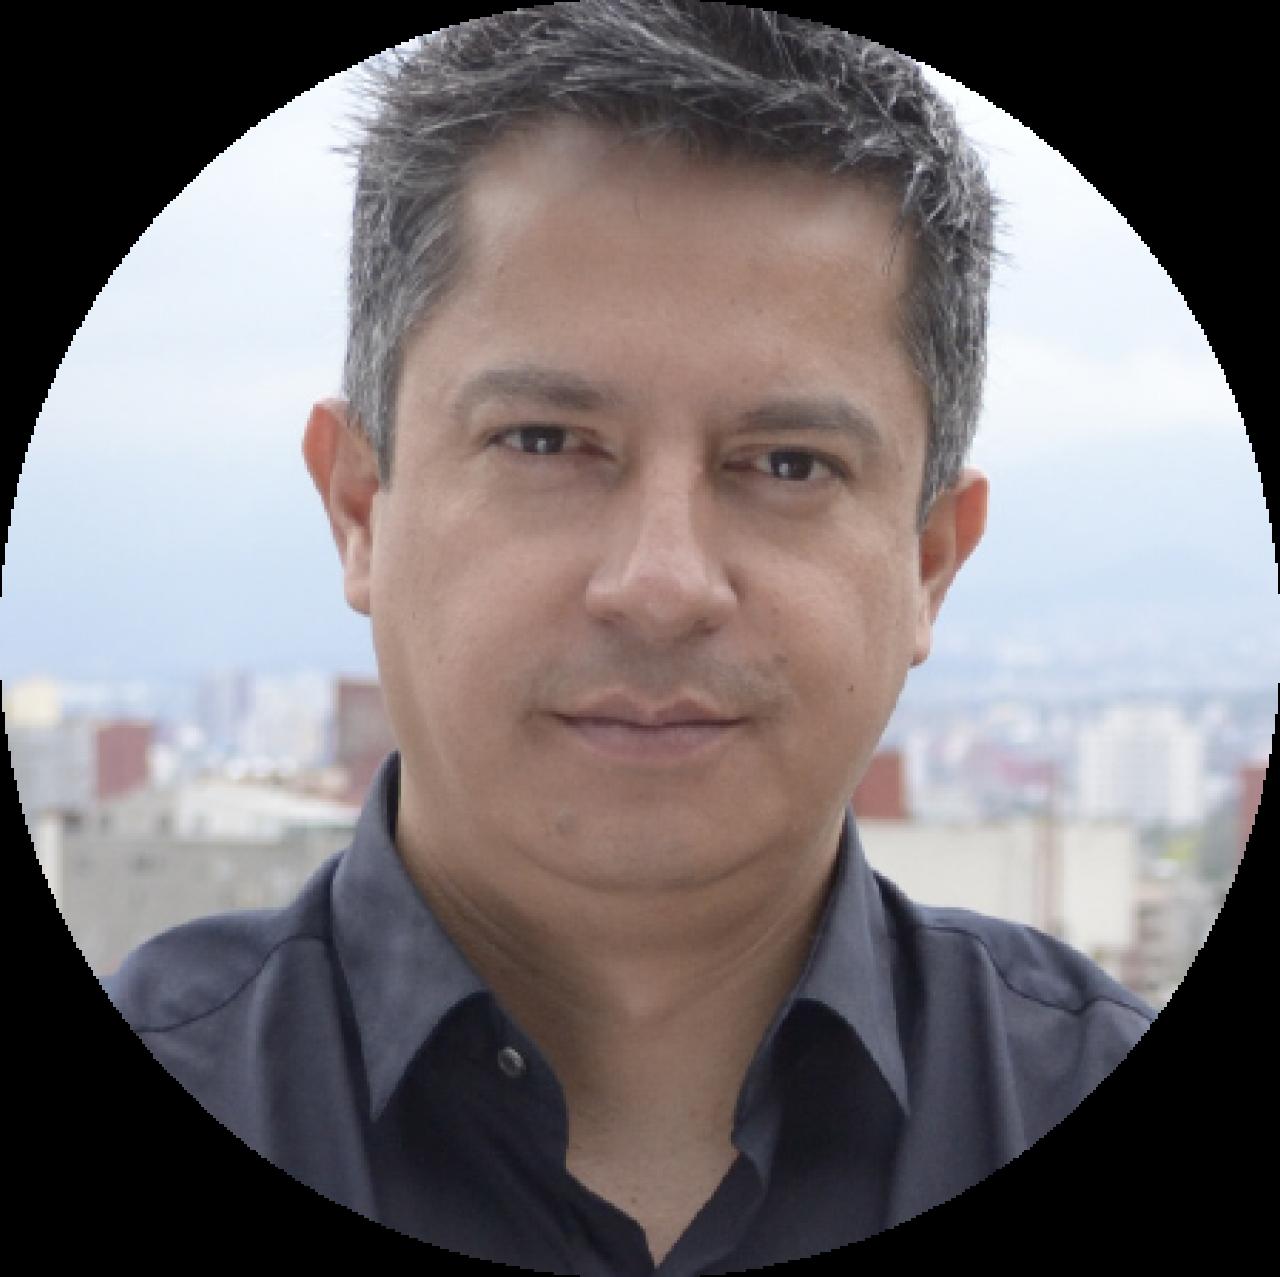 Miguel Torres (Shippify)